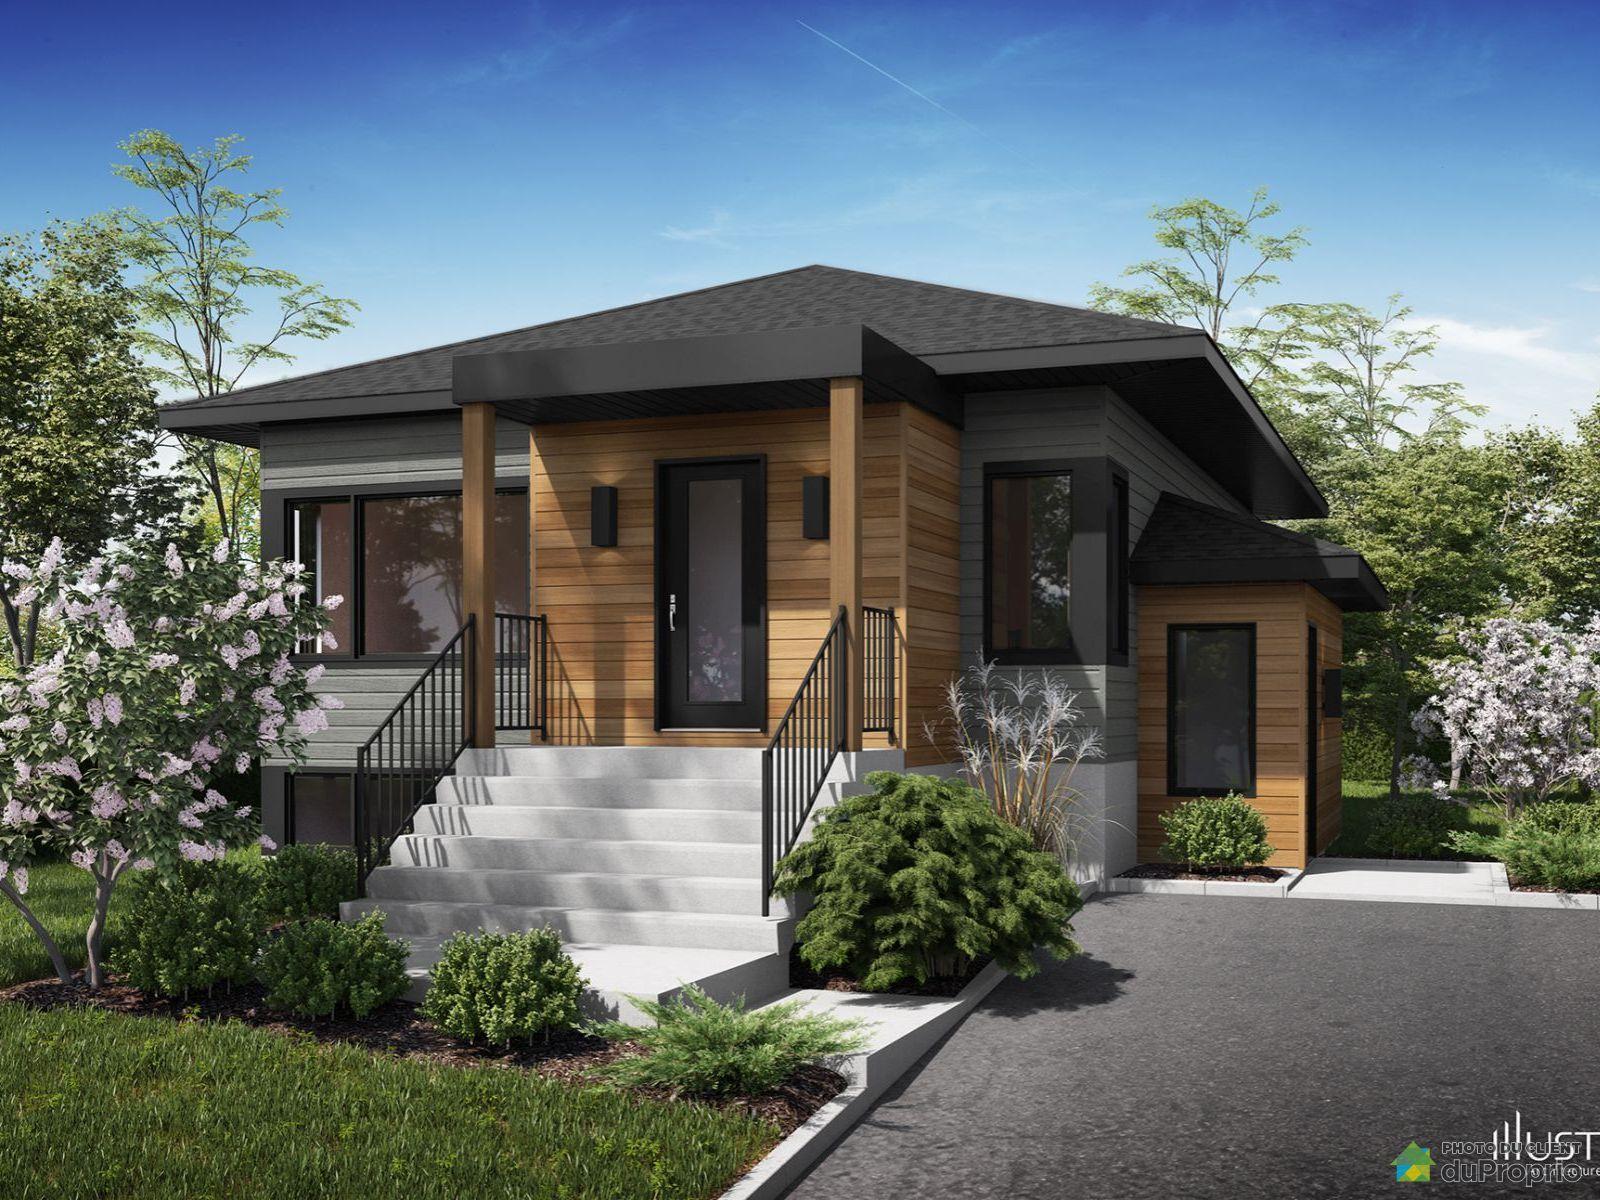 9010 rue fran ois xavier des ves construire par les habitations concept dub mirabel st. Black Bedroom Furniture Sets. Home Design Ideas